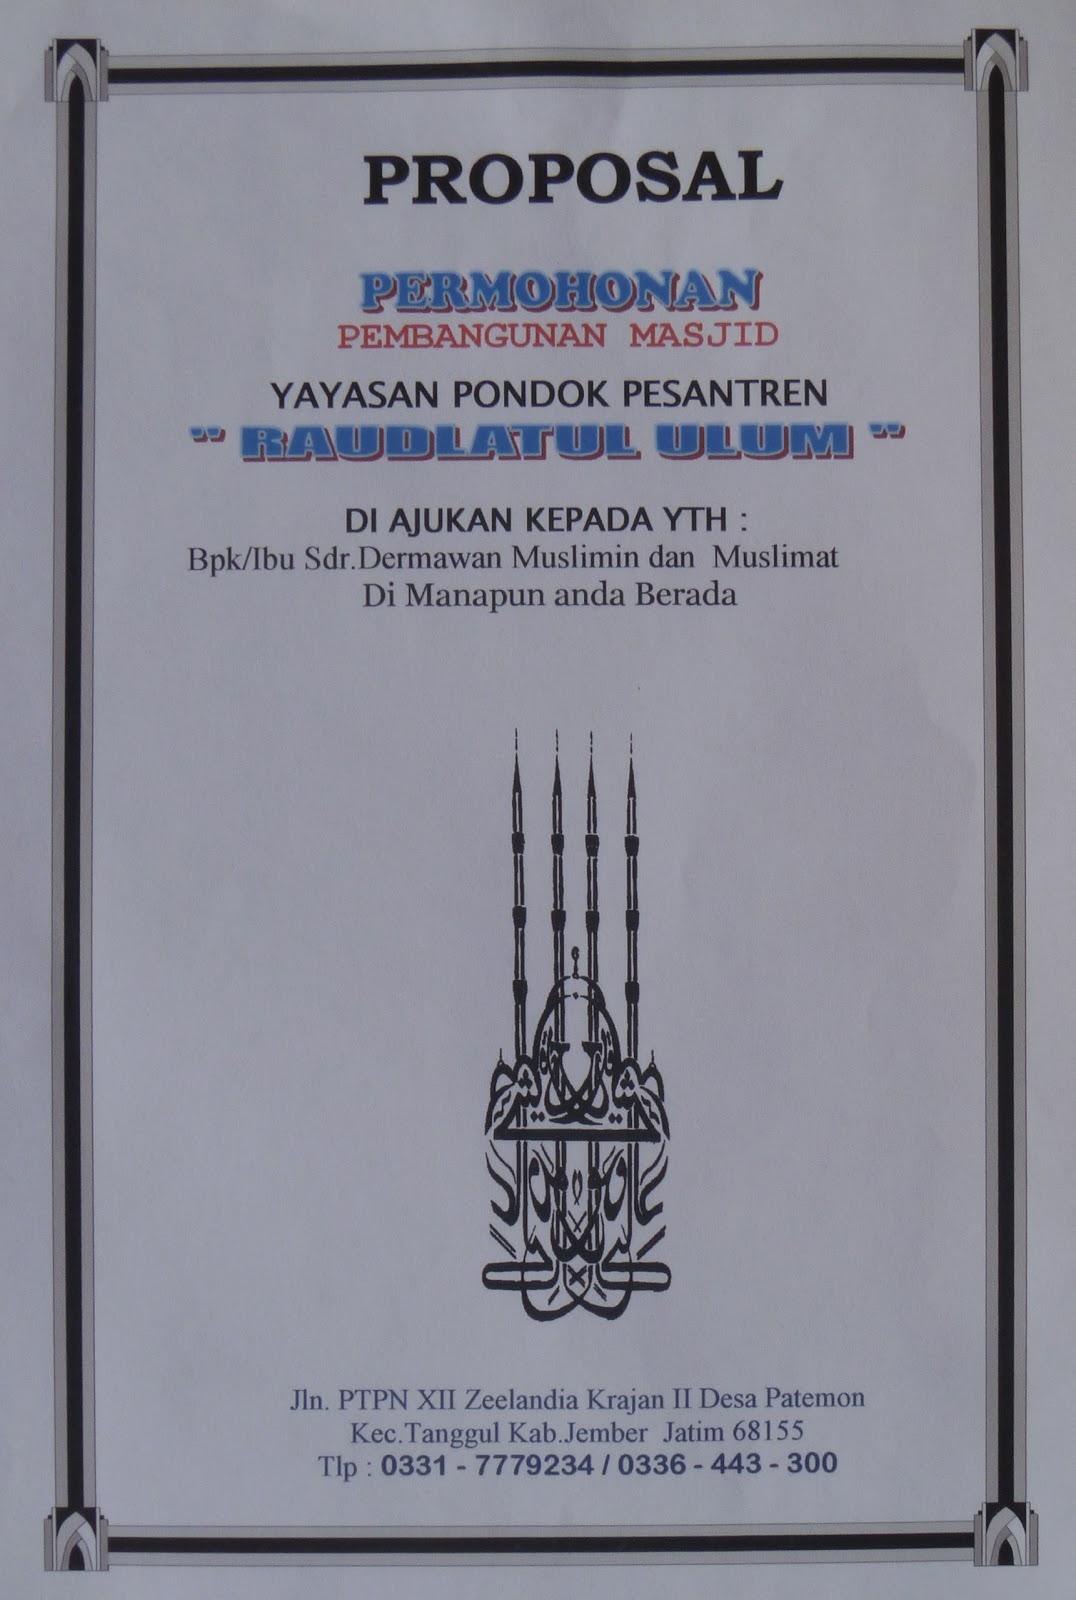 Contoh Contoh Program Pembangunan Ekonomi Contoh Tesis Ukm << Contoh Tesis 2015 Beserta Foto Masjid Raudlatul Ulum